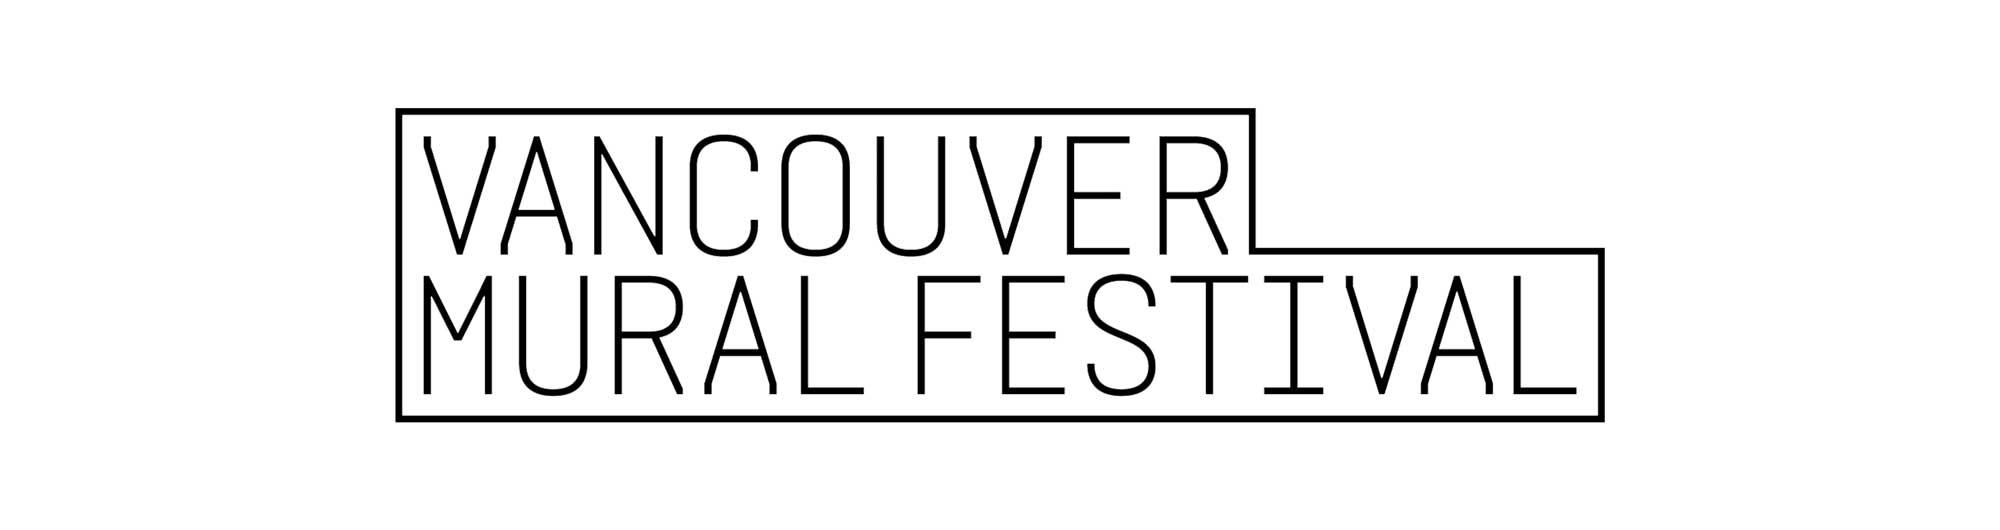 muralfest_logo.jpg